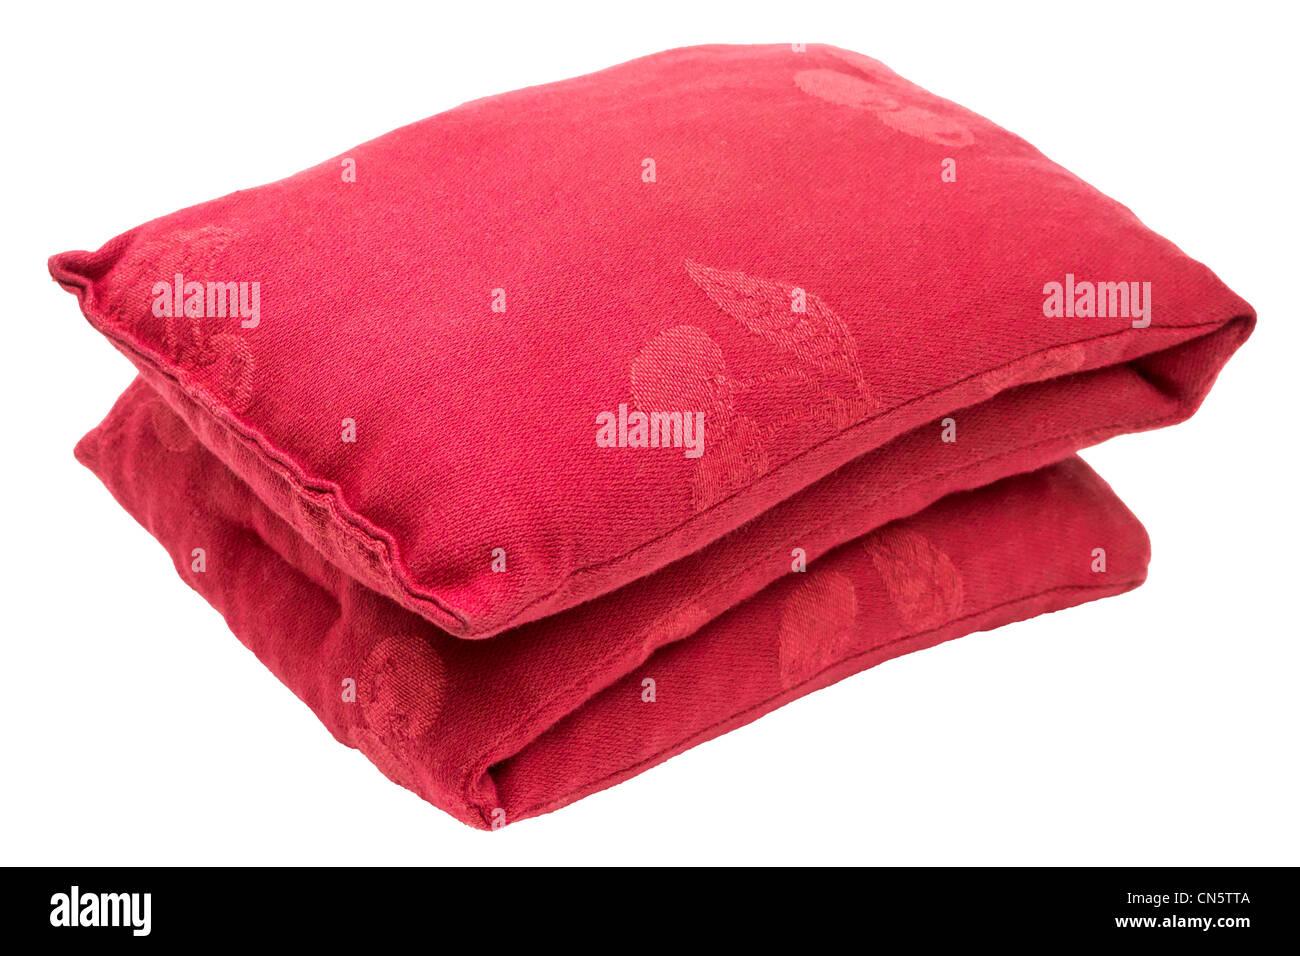 Cherry Stones Cushion - Stock Image